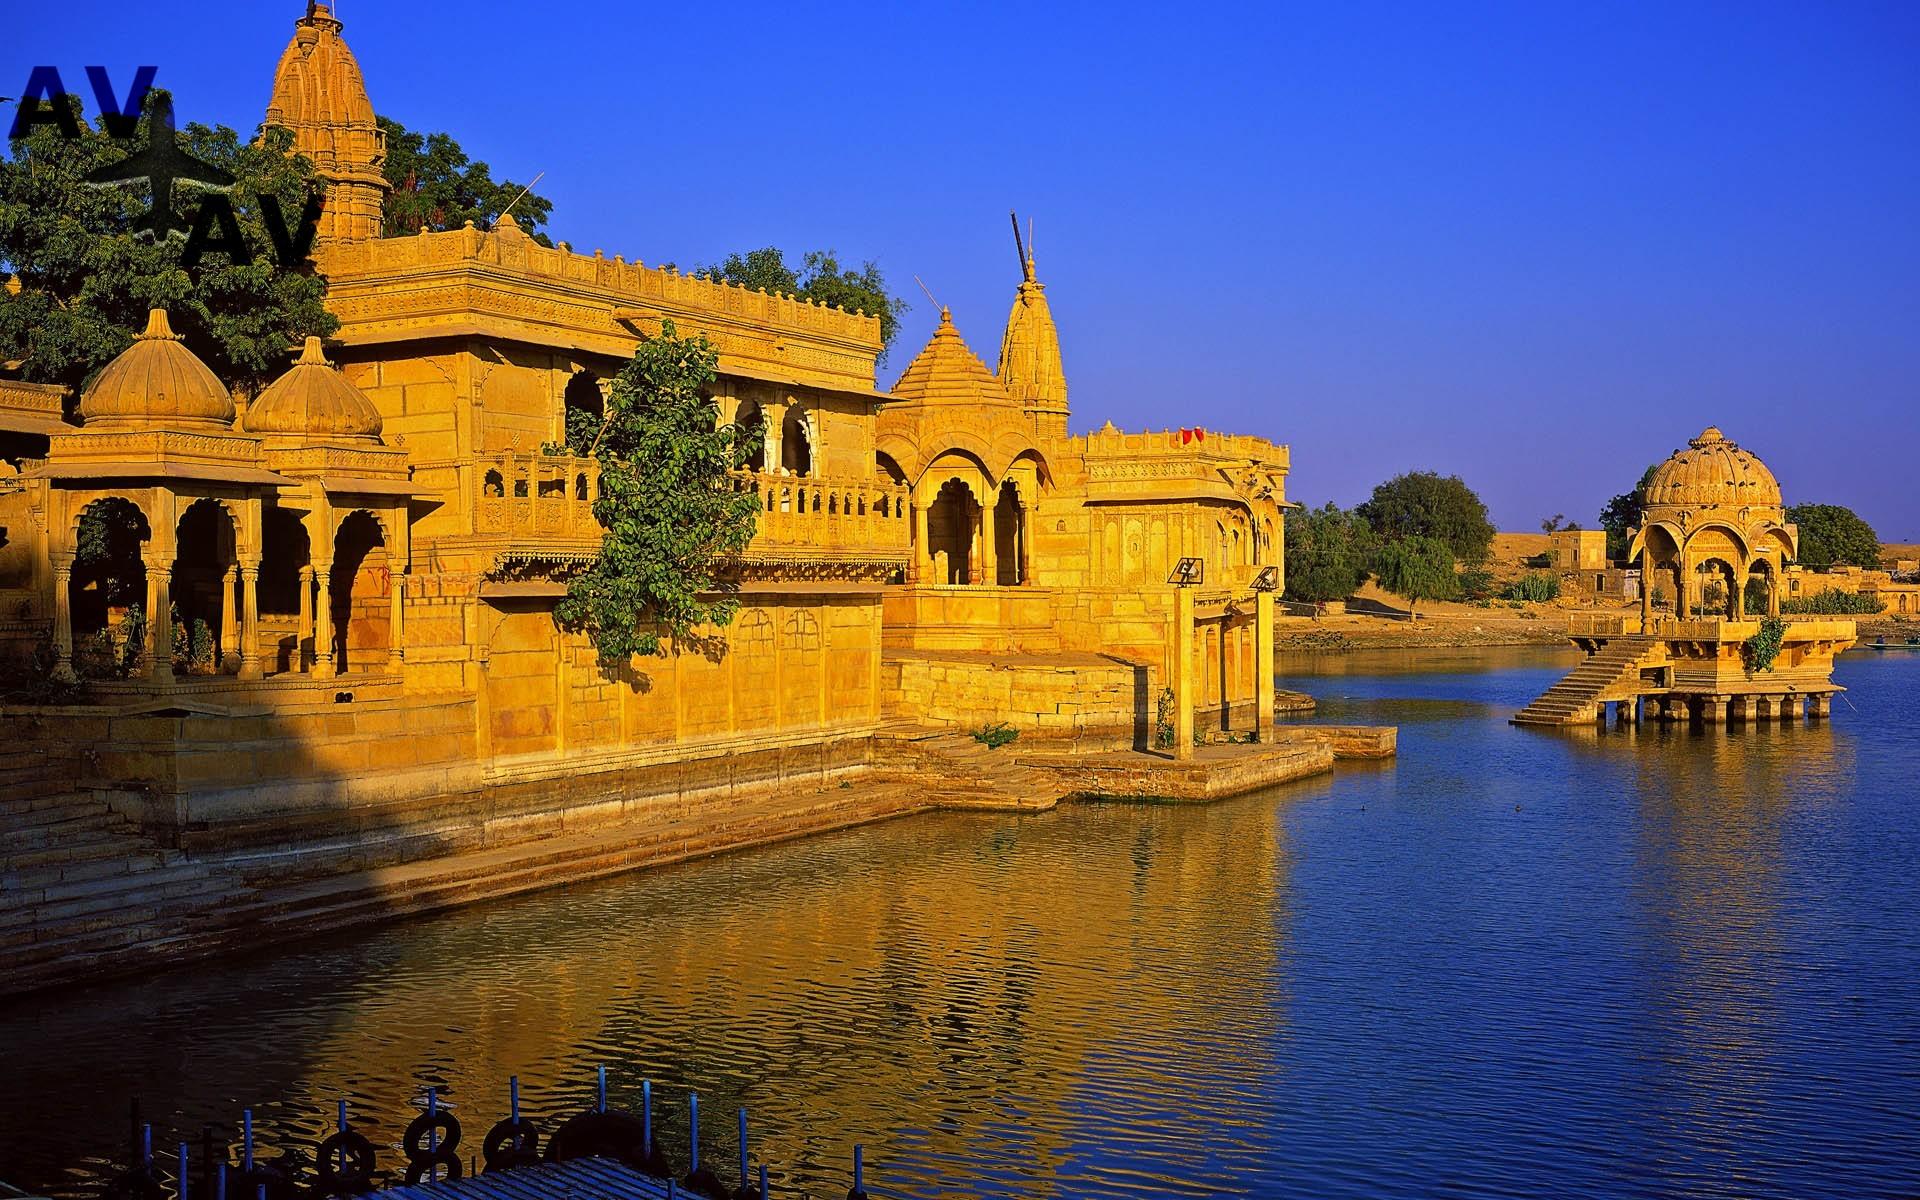 Puteshestvie v Indiyu - Путешествие в Индию